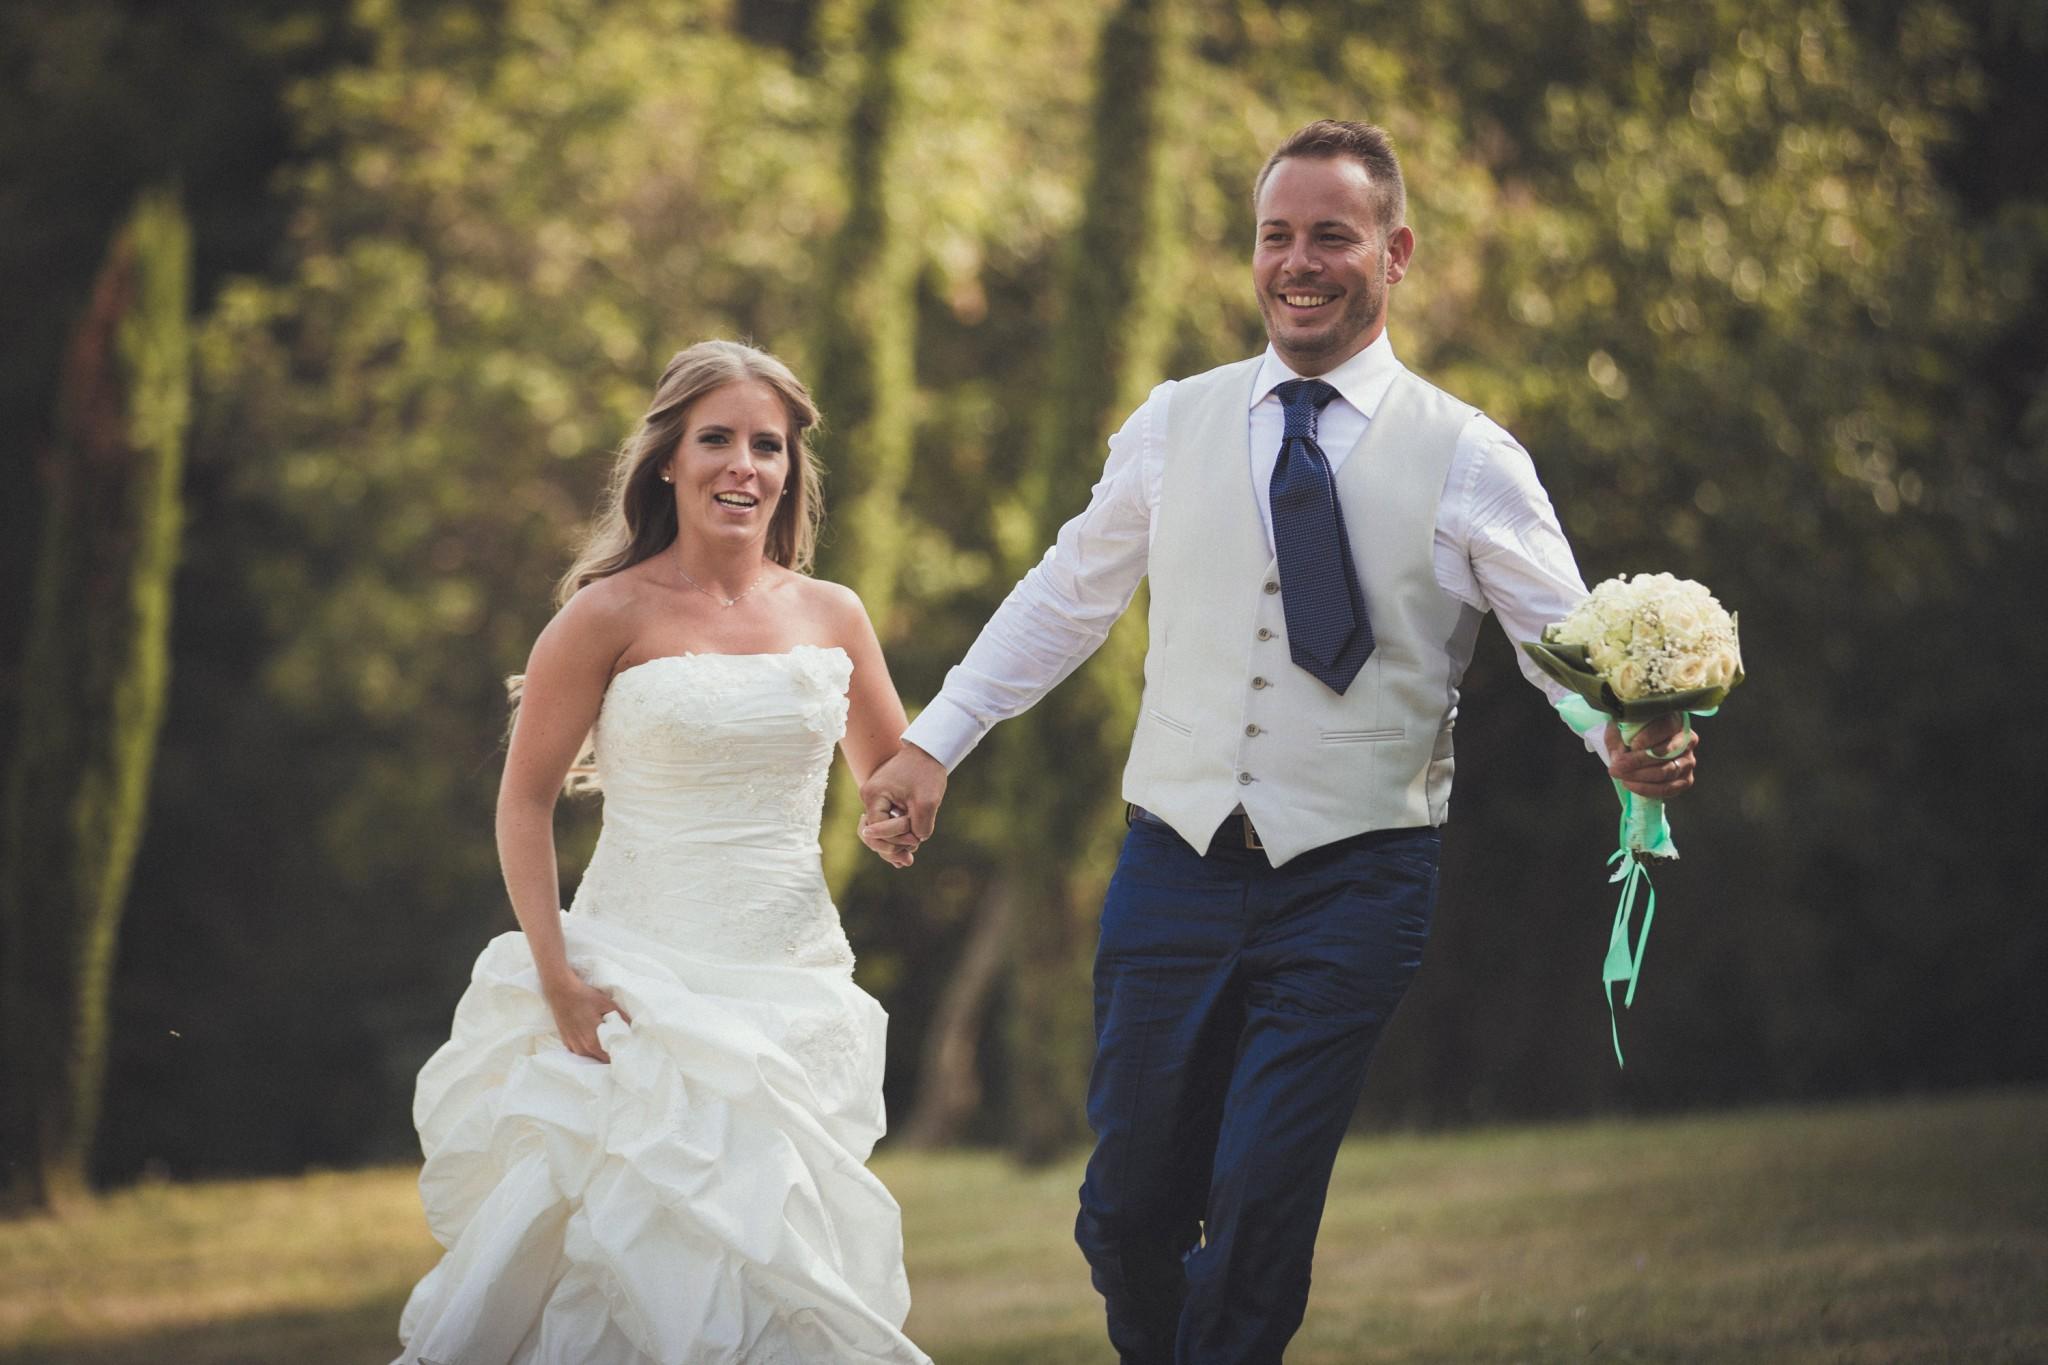 Matrimonio con prestana